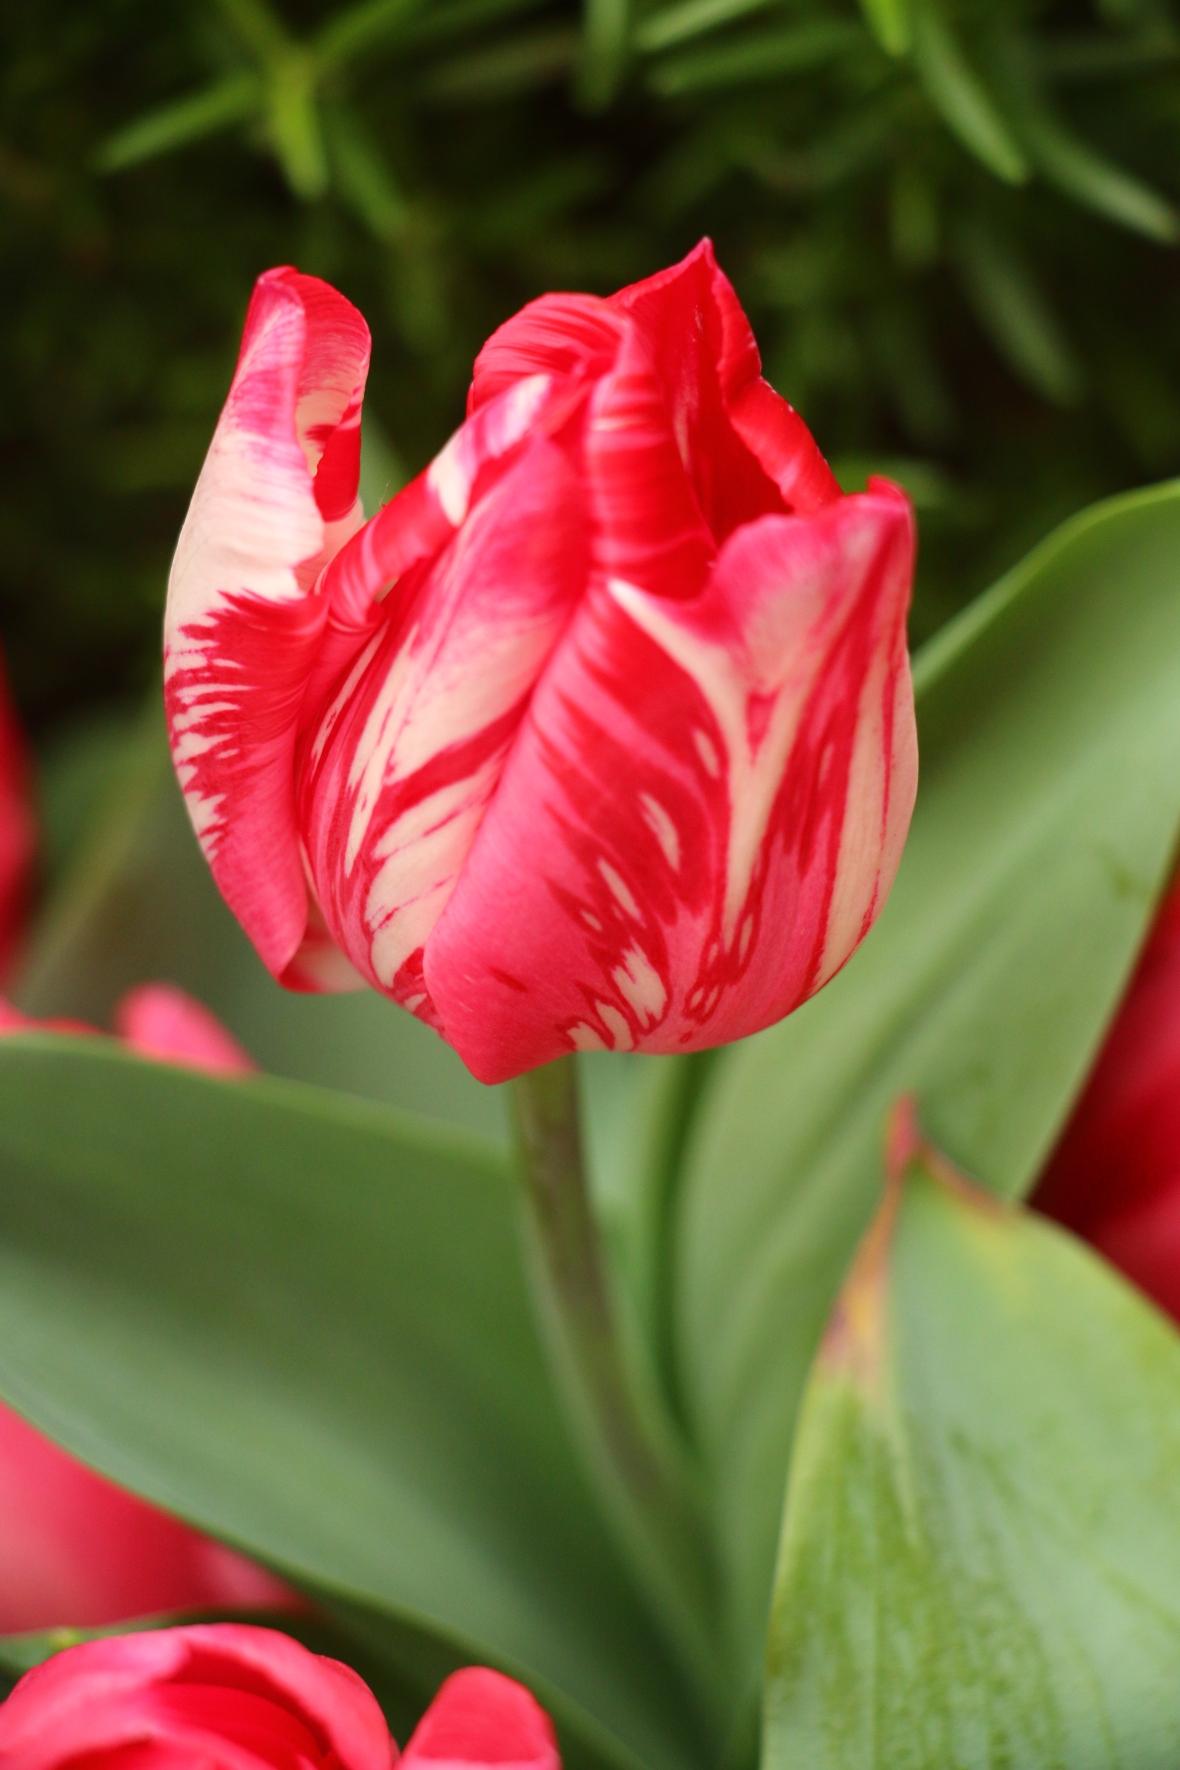 Variegated Red & White Tulip Macro II